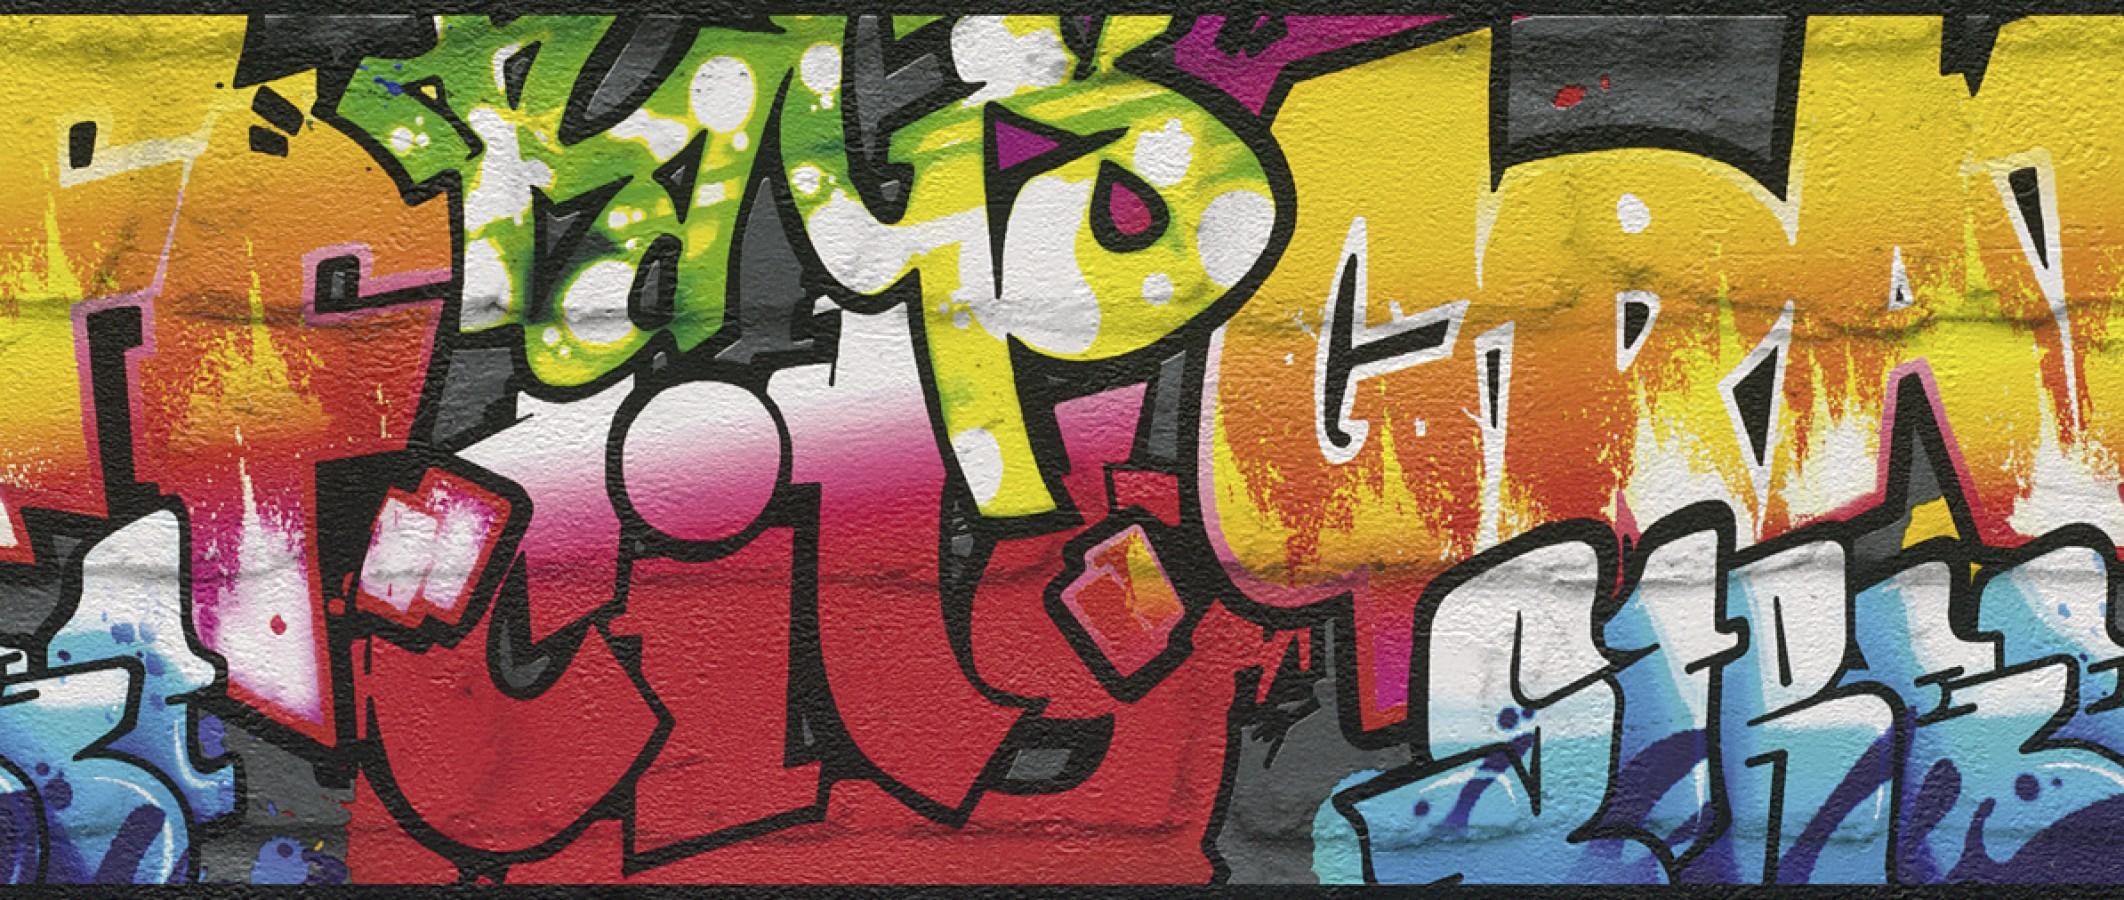 Cenefa muro de graffiti estilo urbano multicolor Urban Graffiti 6296